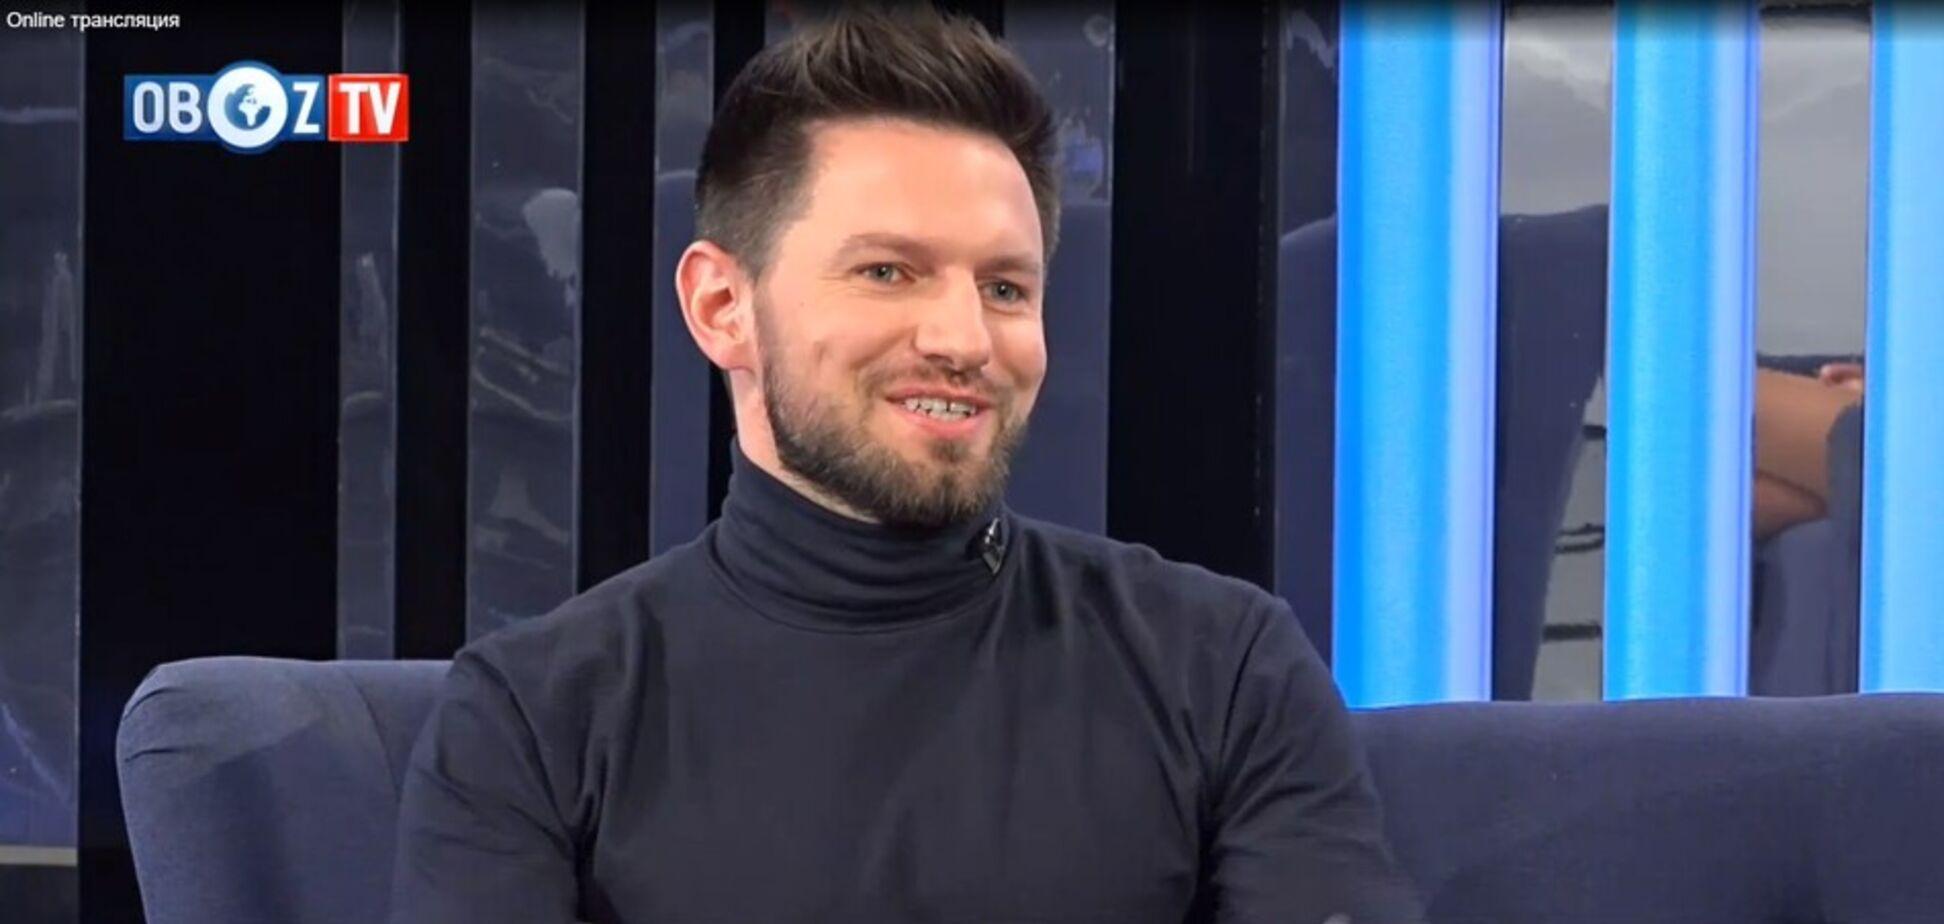 Музыкант Орест Галицкий стал гостем инфо-панк шоу 'Бурчук Live'